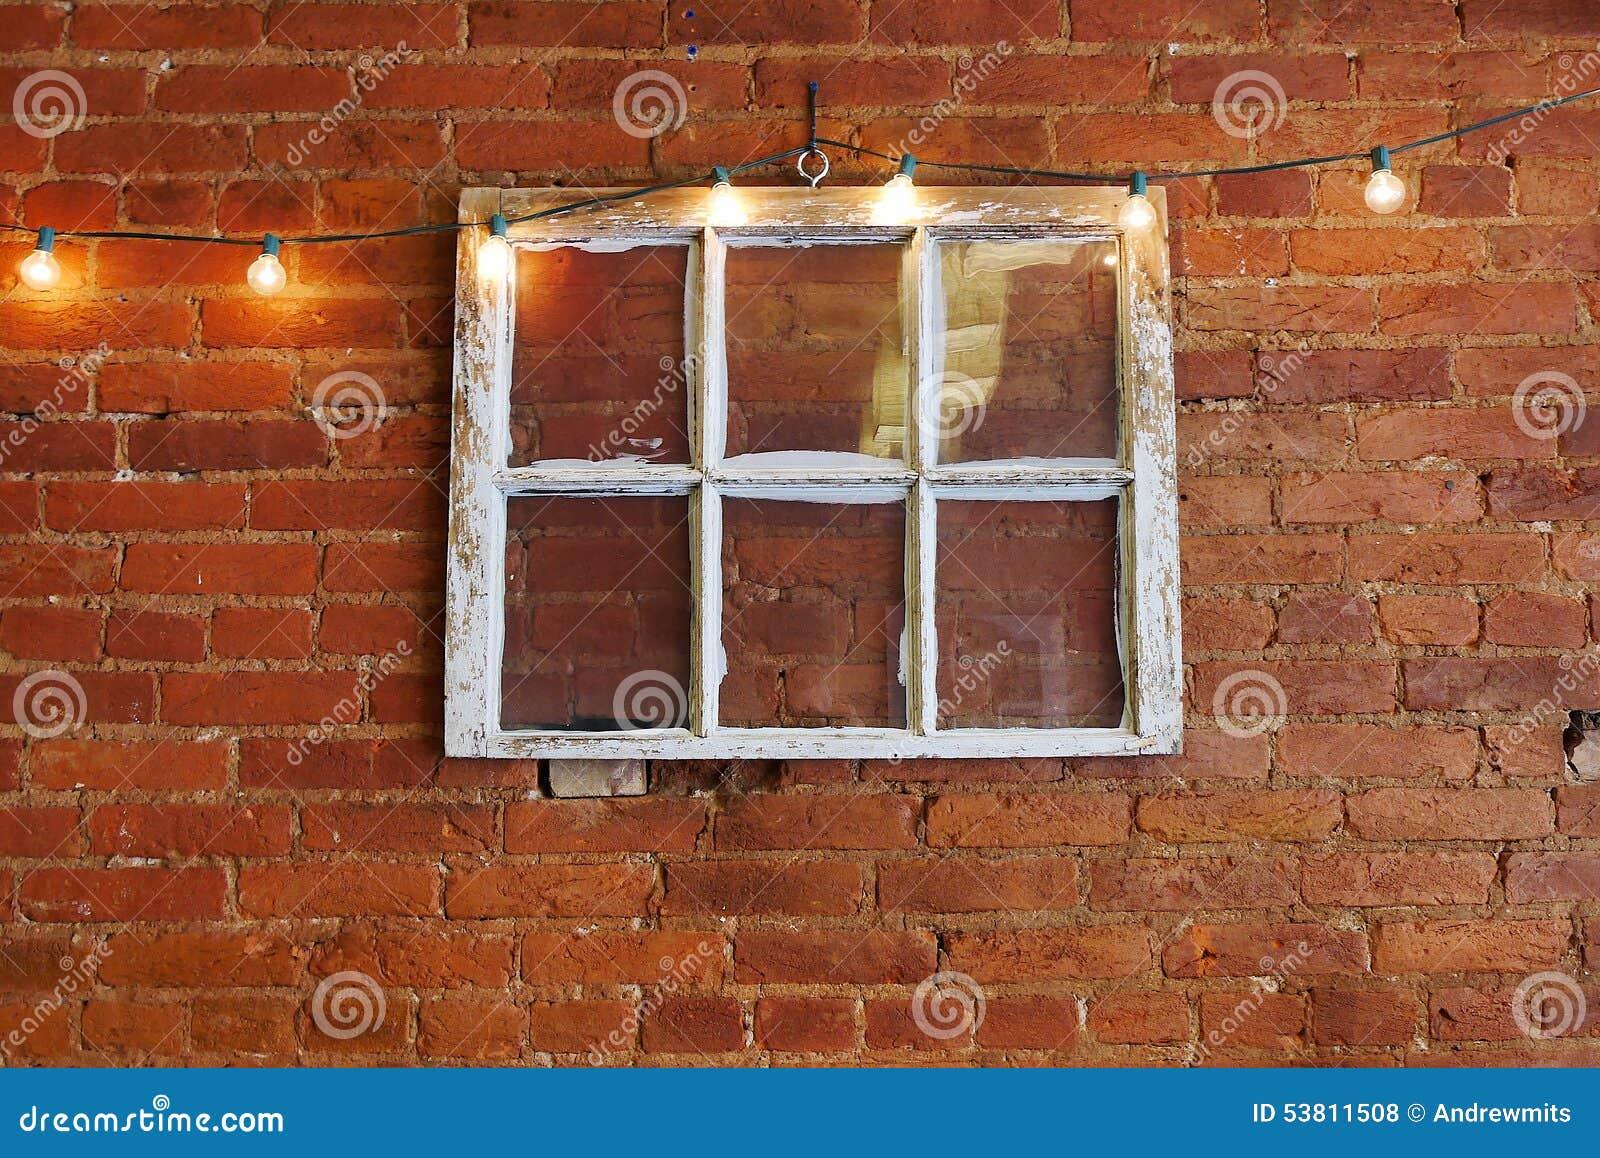 Vintage Six Pane Window Stock Photo - Image: 53811508